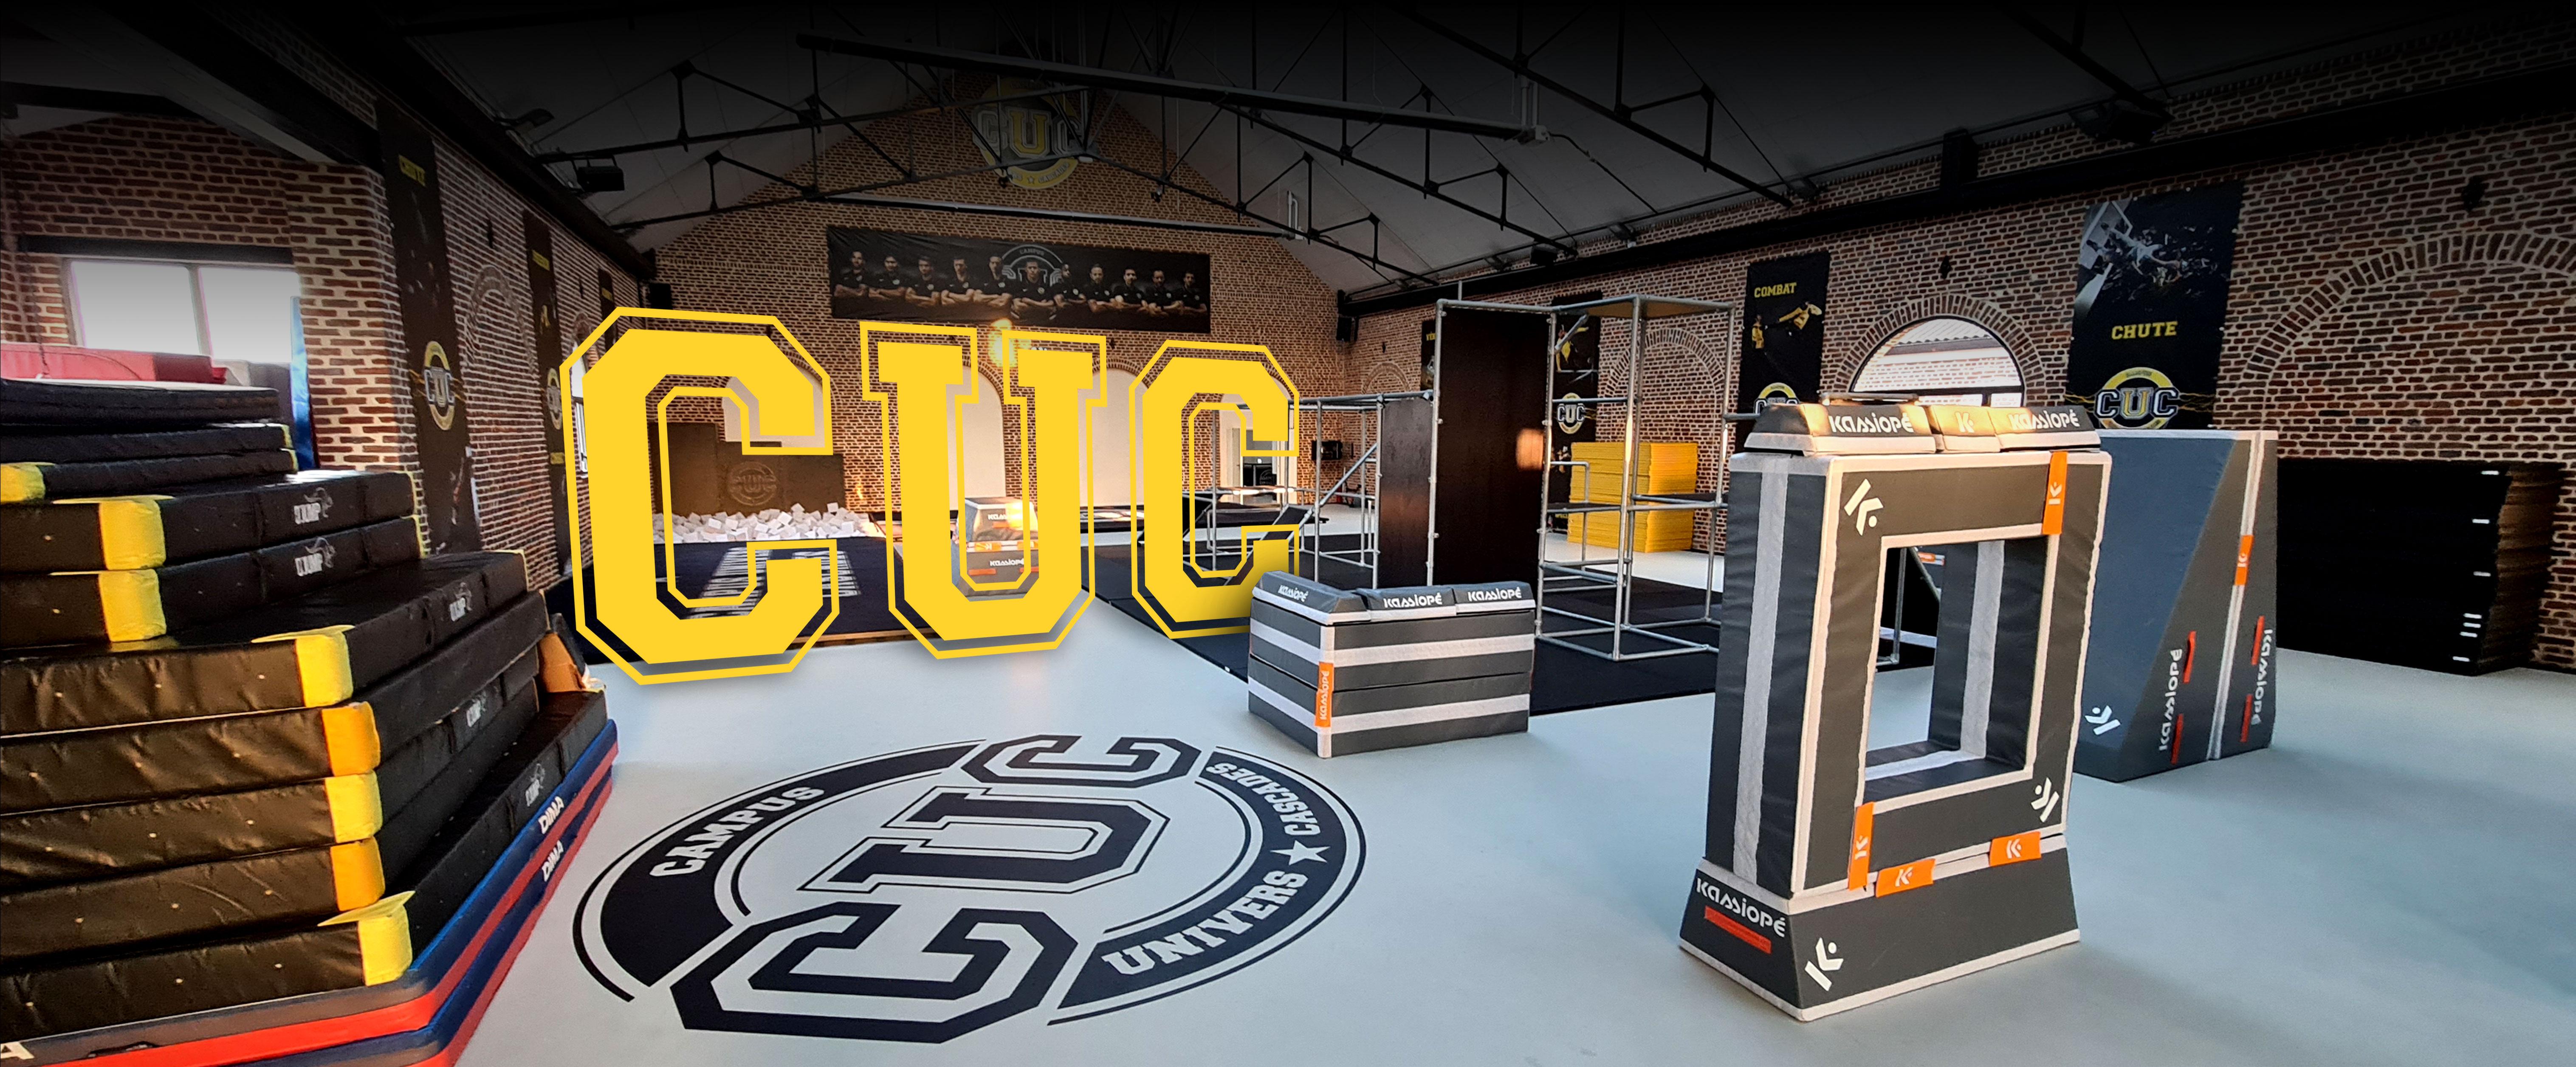 CUC Campus Univers Cascade